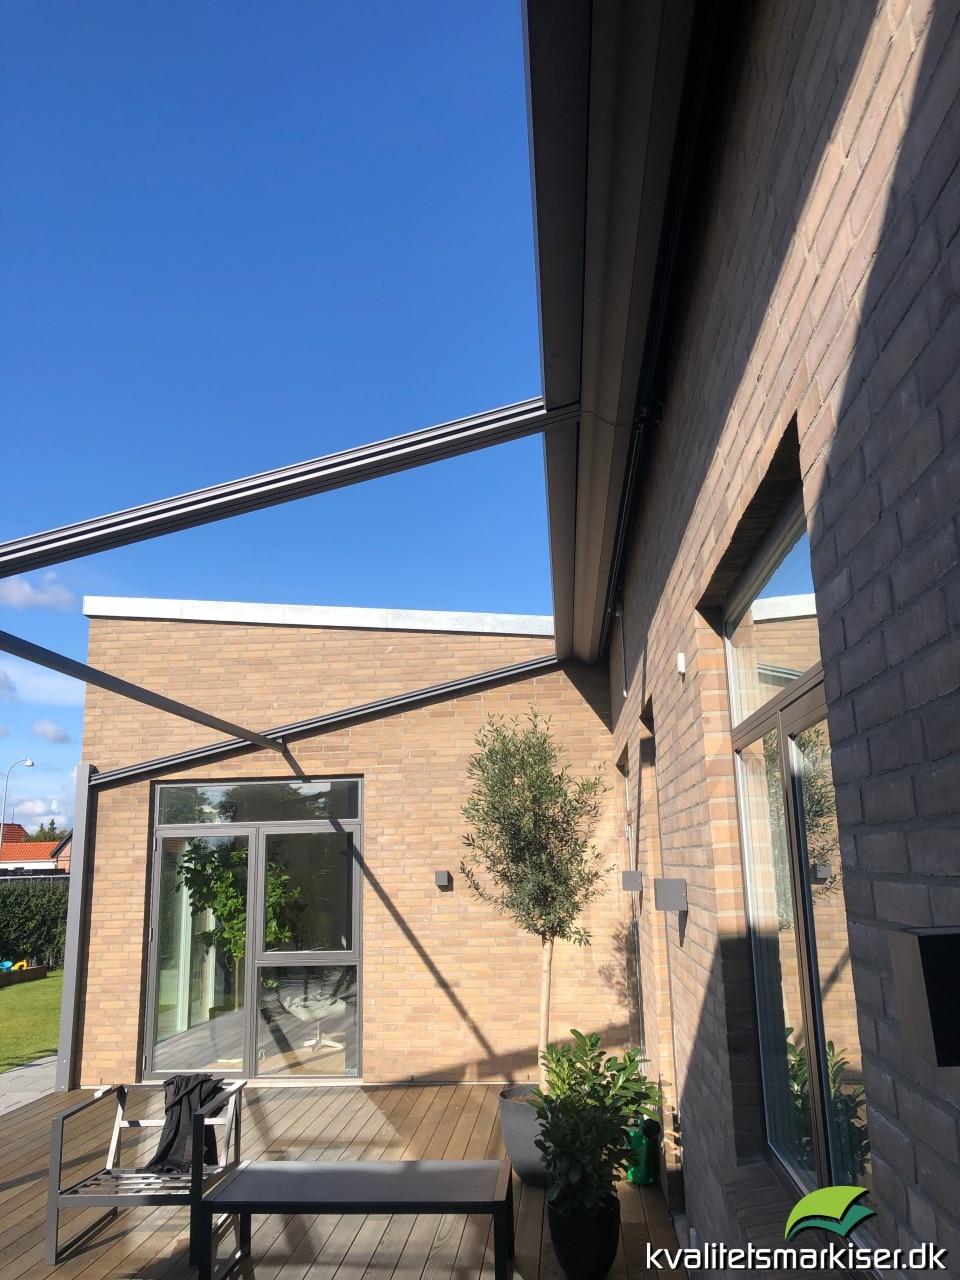 Renson Lapure pergolamarkise dobbelt monteret på privat hus i Hvidovre